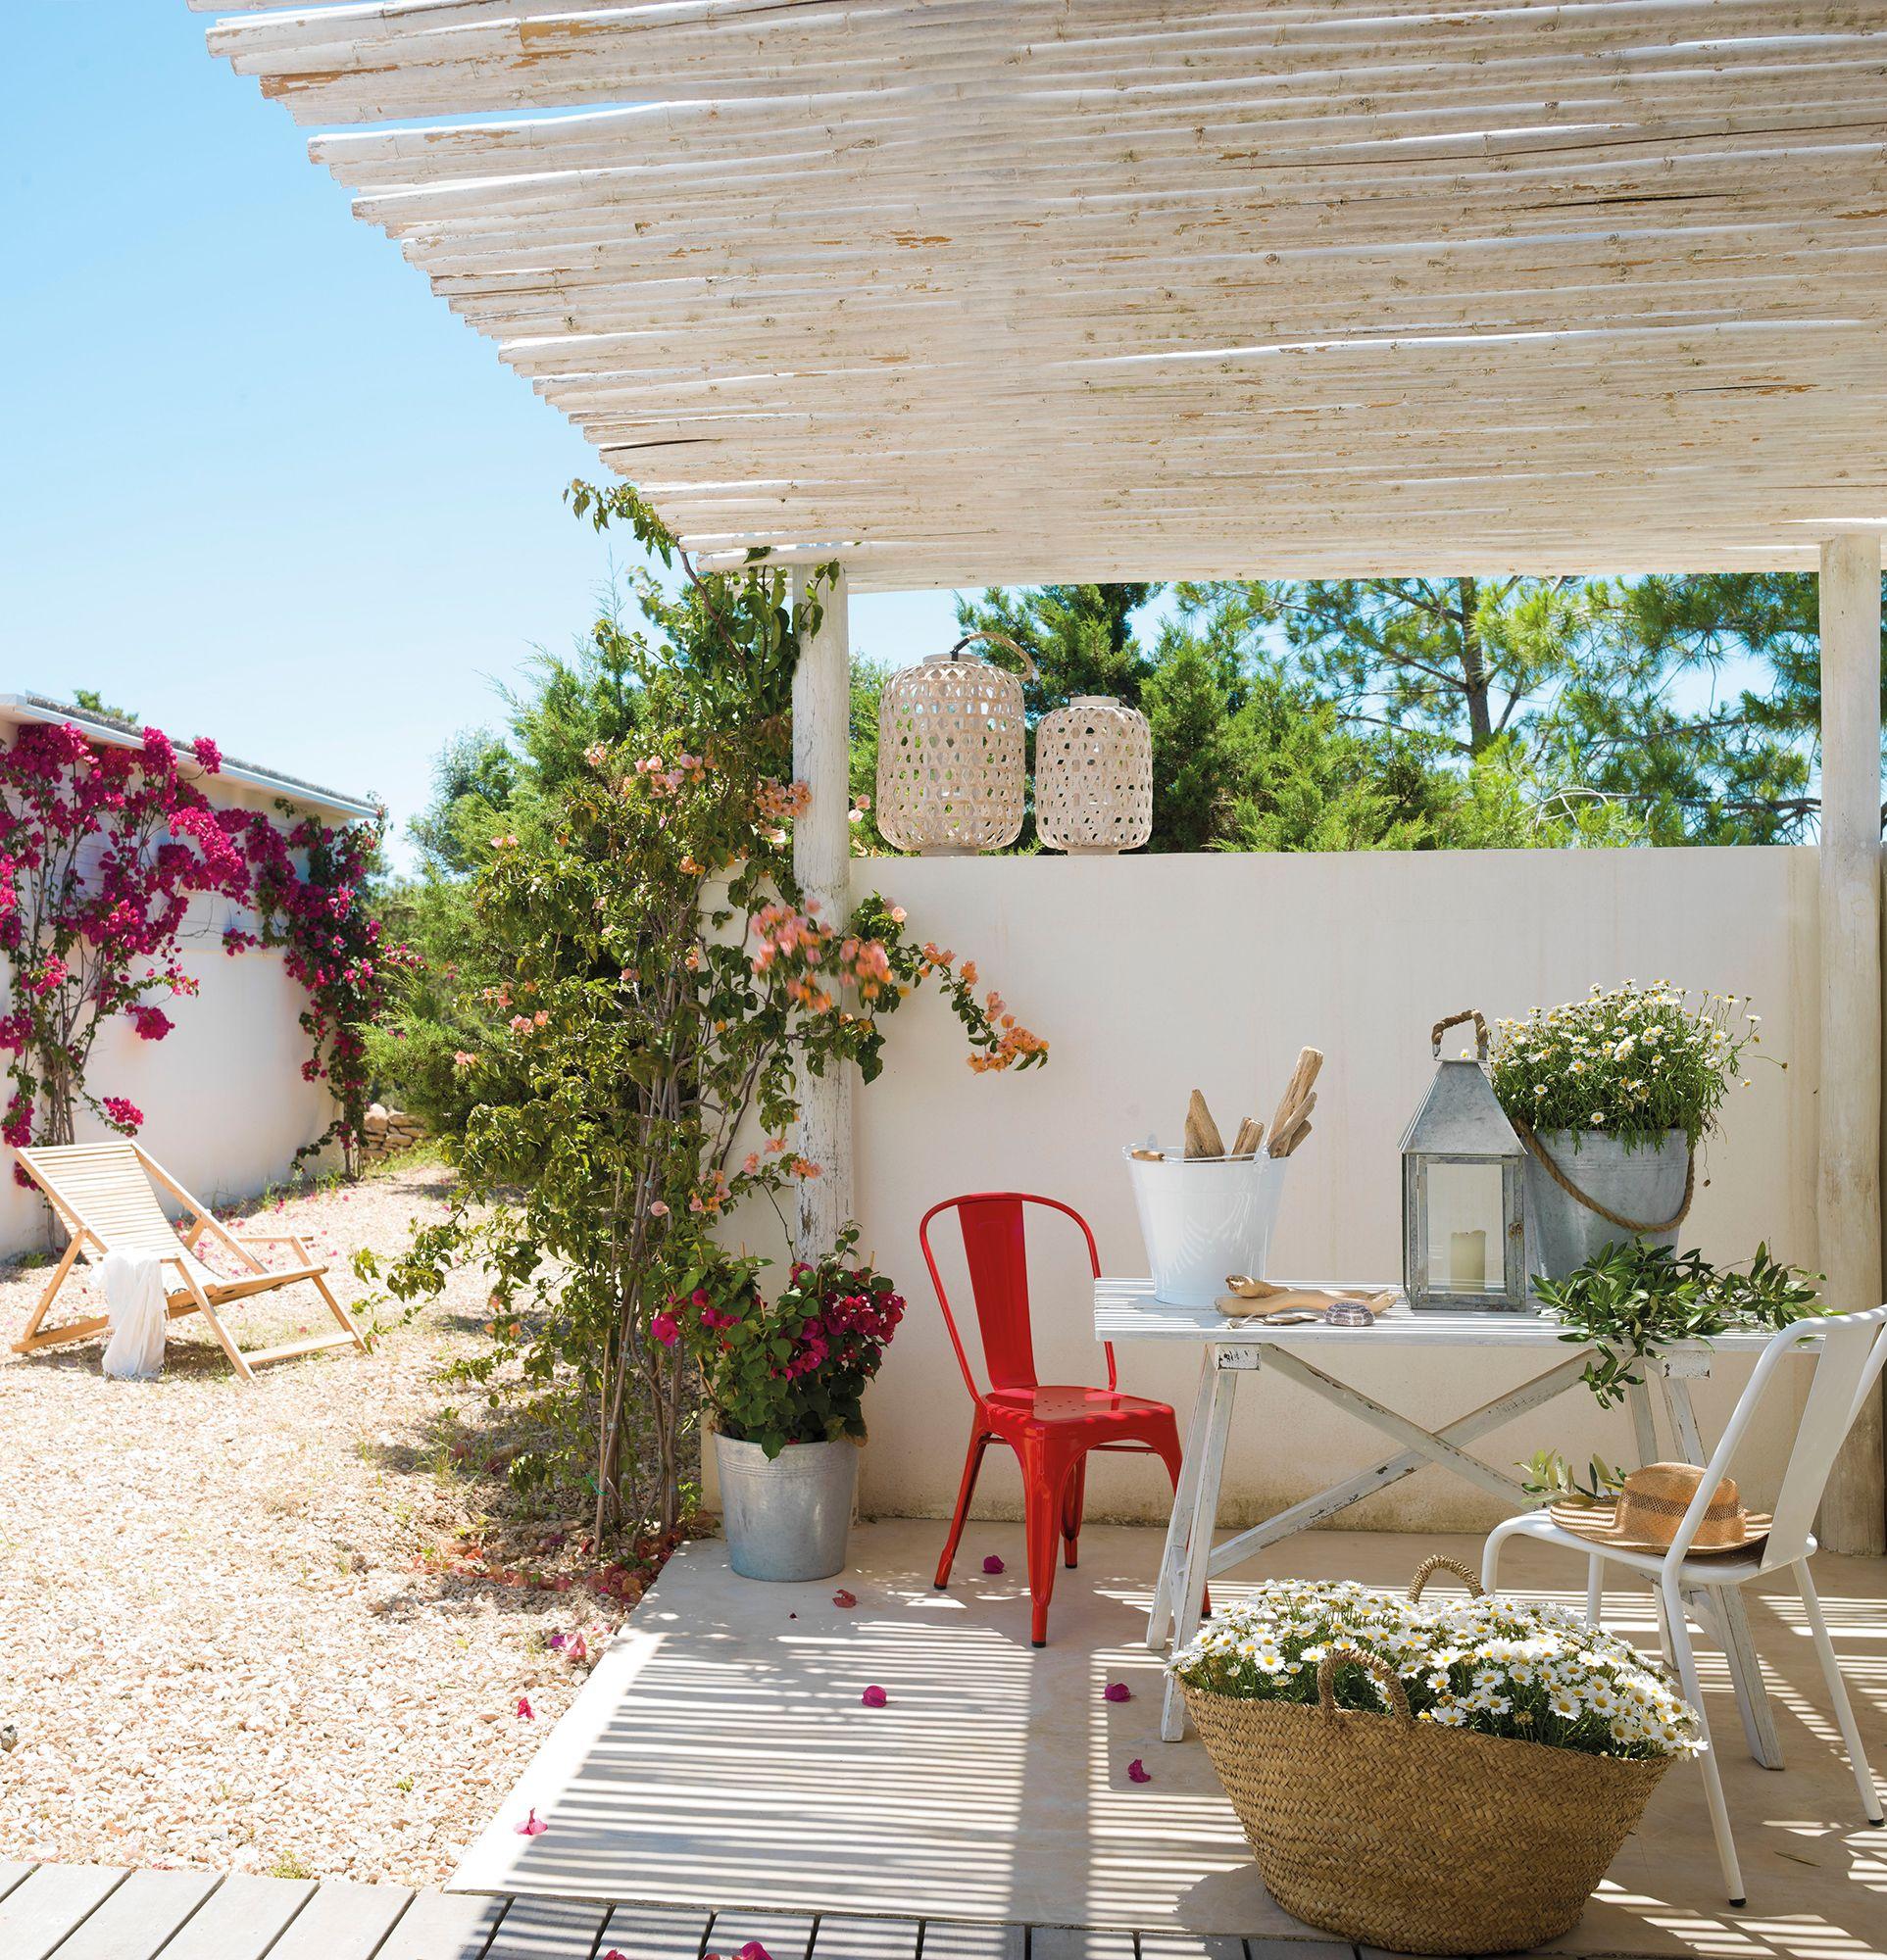 Pérgola con techo de ca±izo blanco en mini porche ibicenco Lots